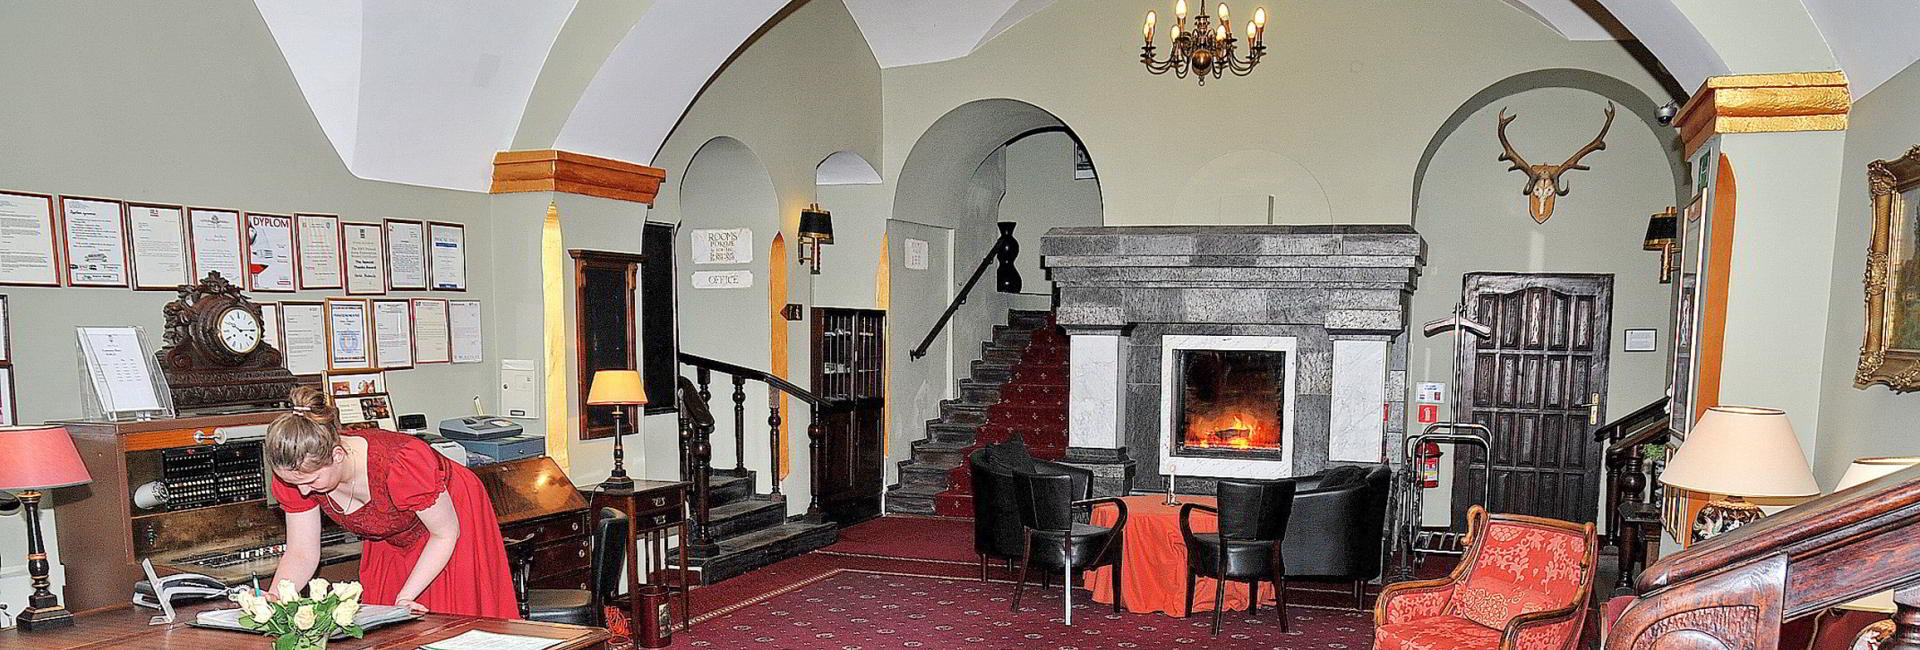 Lobby at Castle Hotel Podewils in Krag, Poland